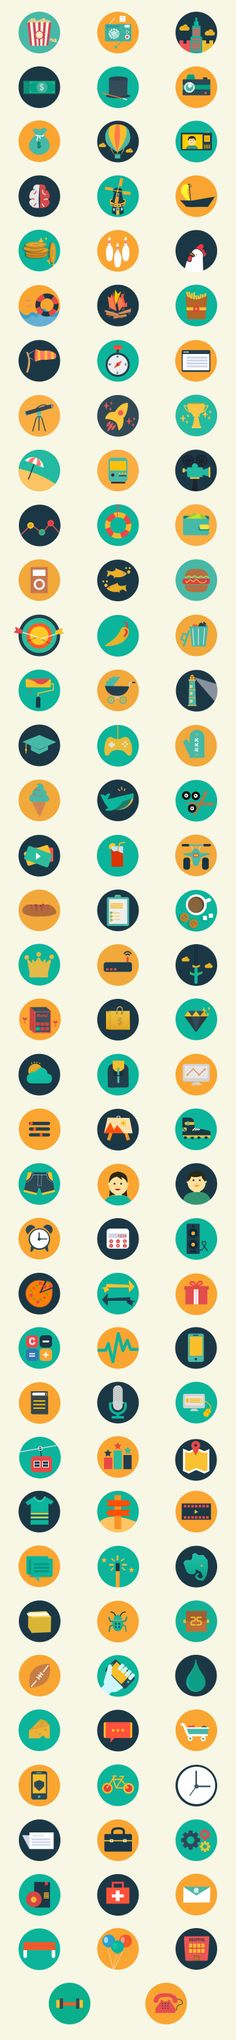 Meroo – A Gorgeous Flat-Styled Icon Set (110 Icons)